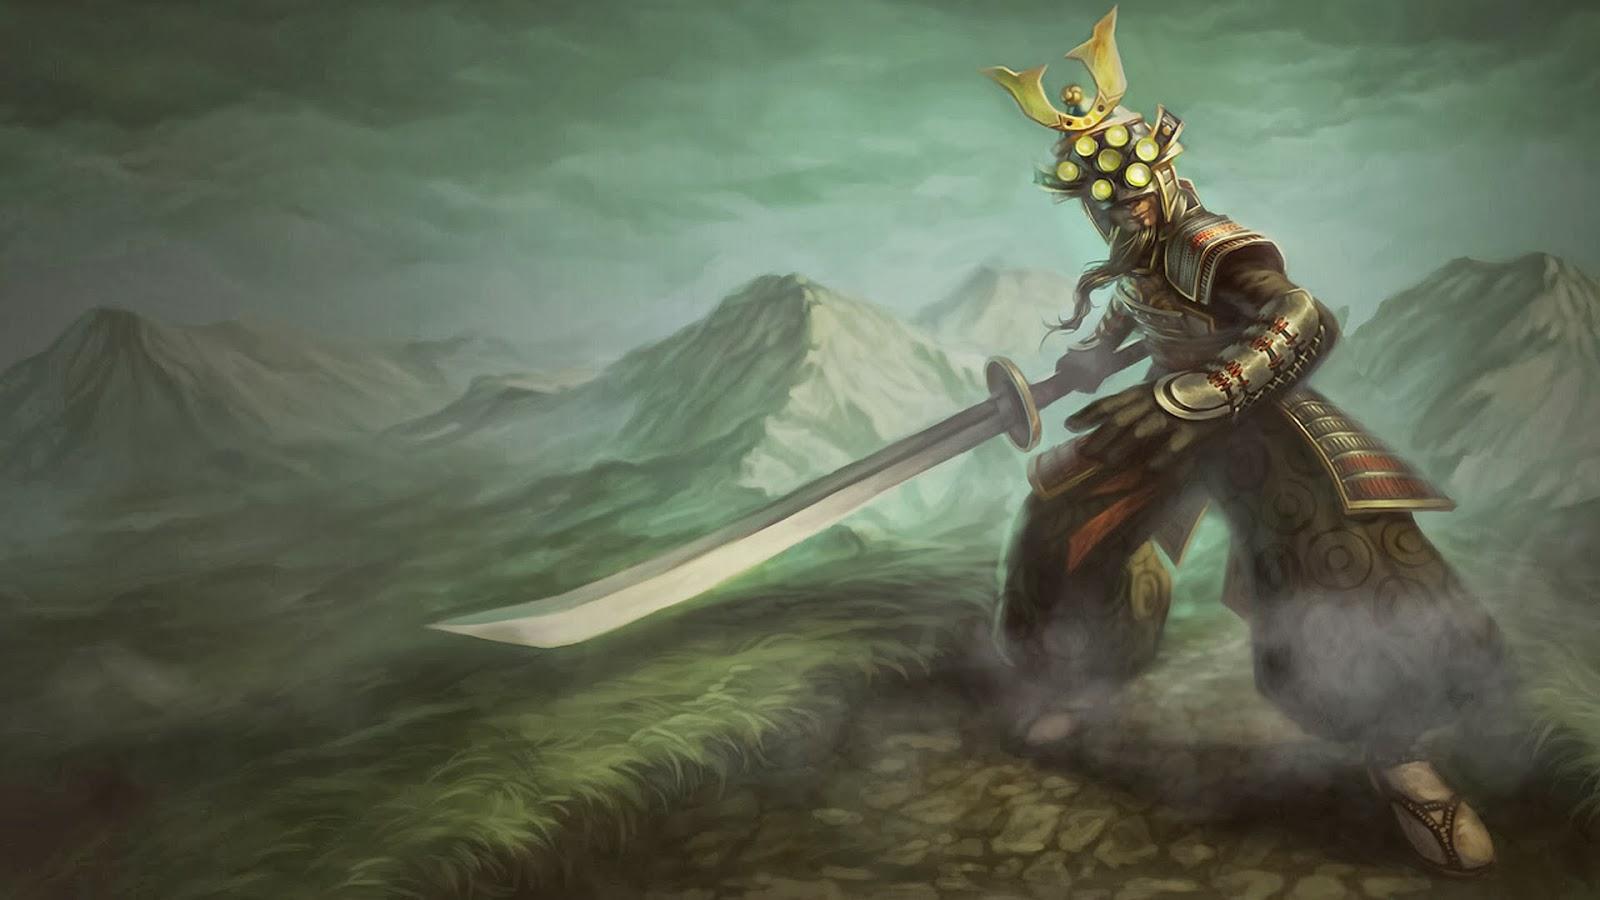 Master Yi League of Legends Wallpaper, Master Yi Desktop ...